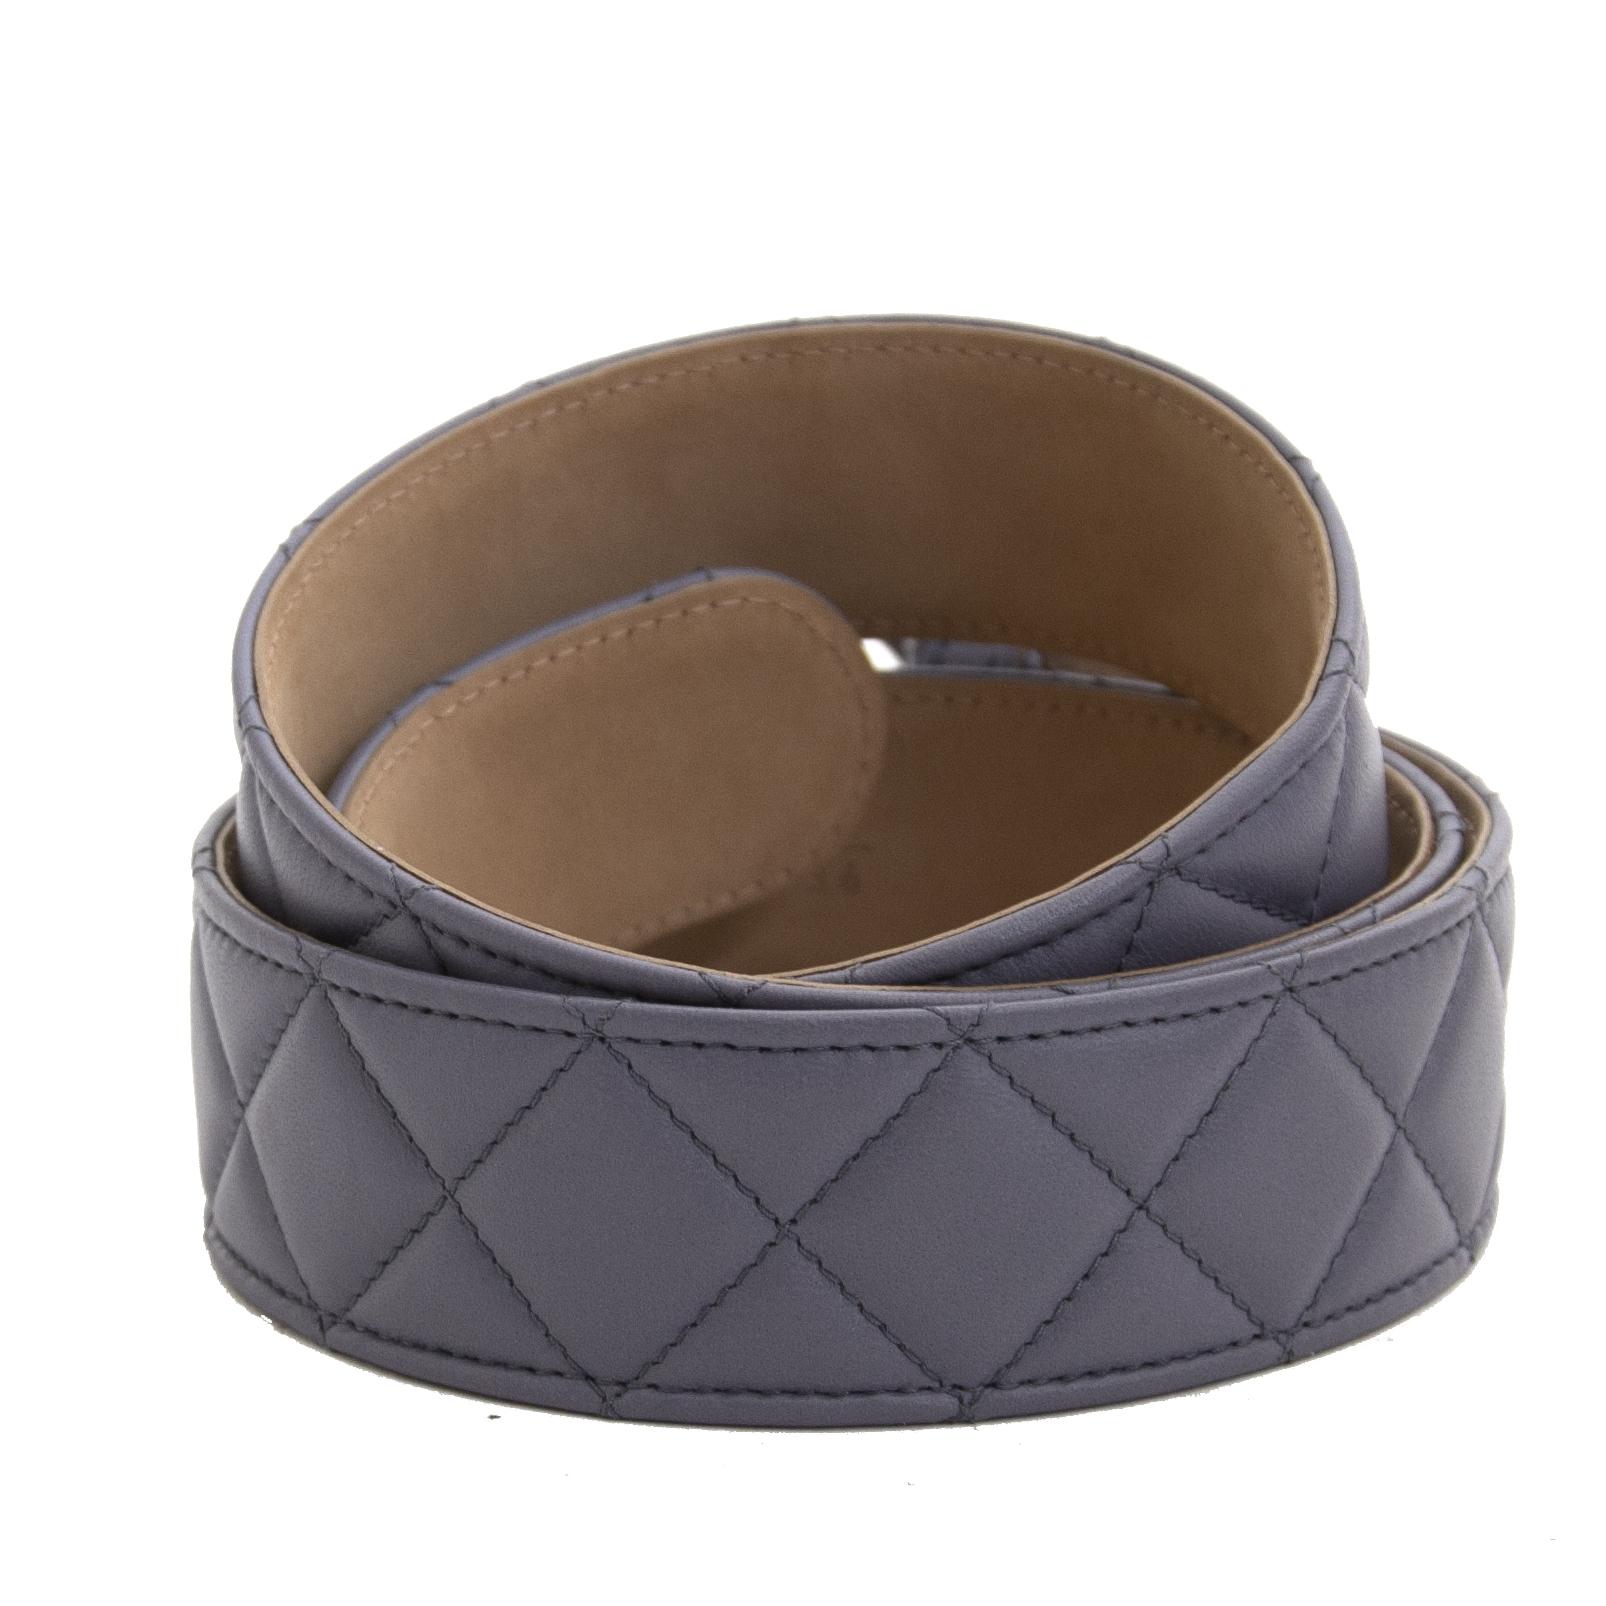 acheter en ligne seconde main Chanel Lavender Belt - Size 90